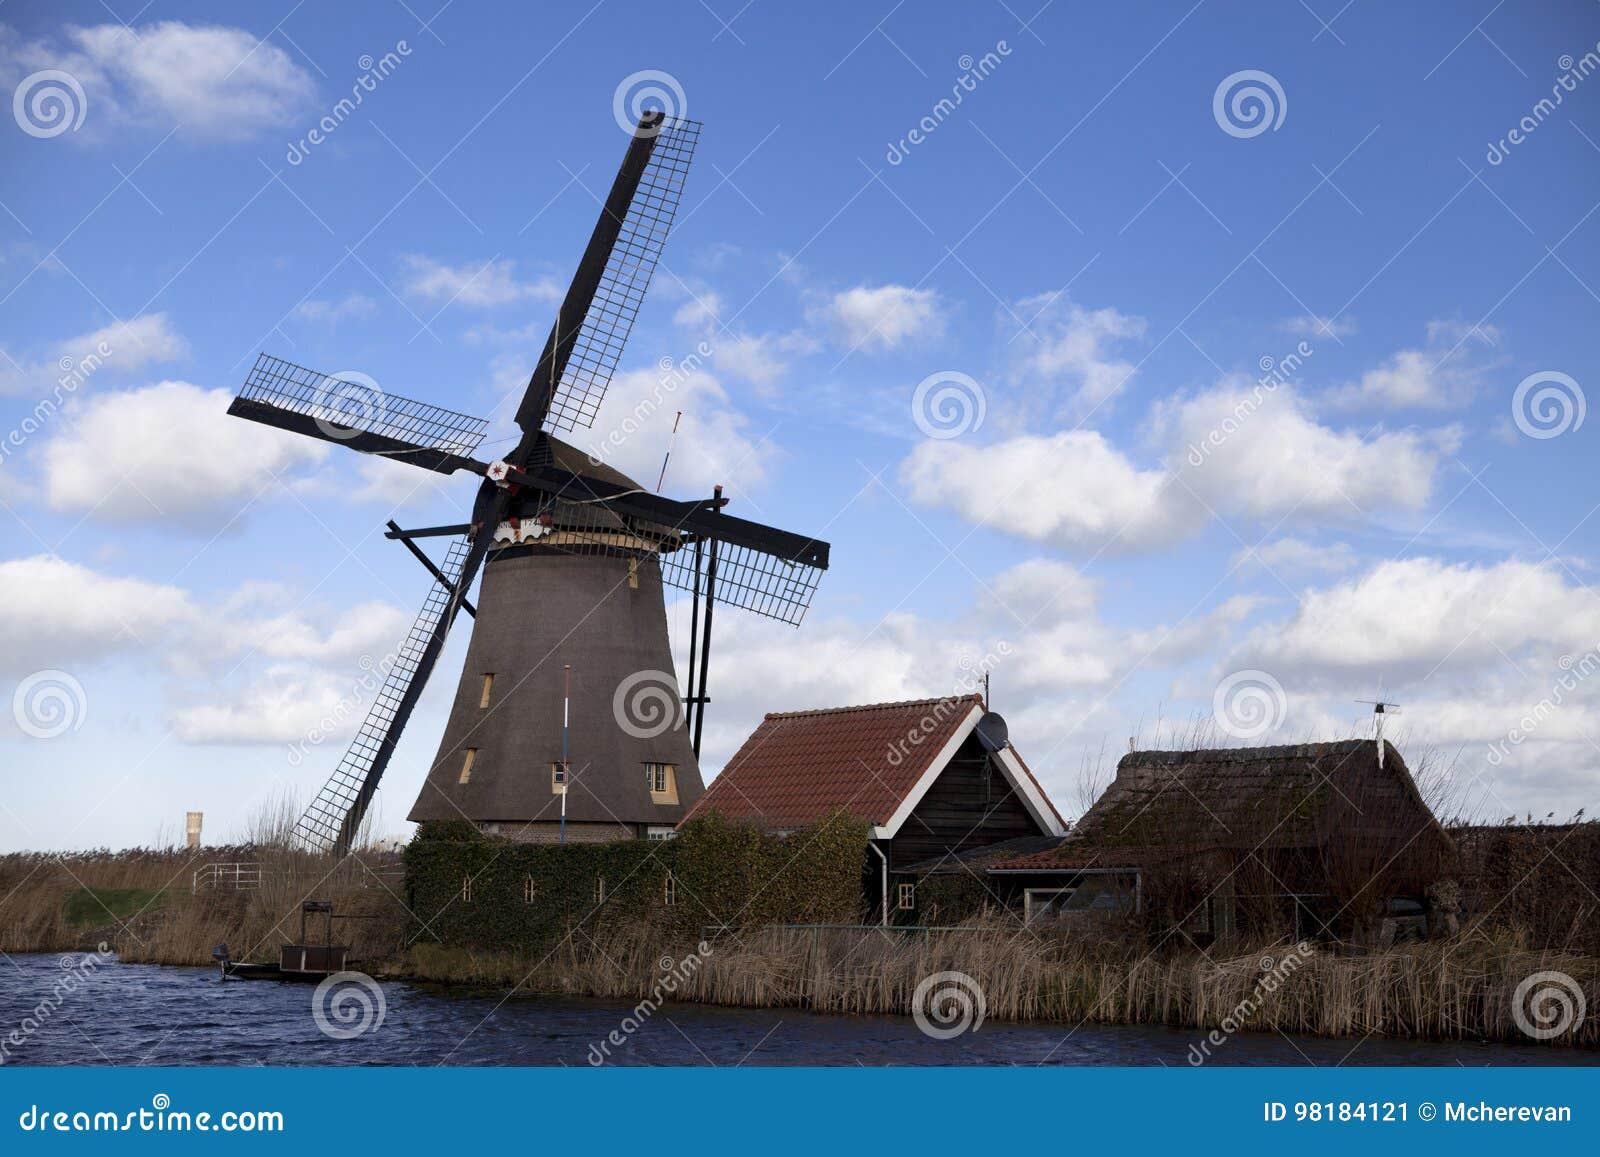 Dutch Windmills Holland Rural Expanses Windmills The Symbol Of